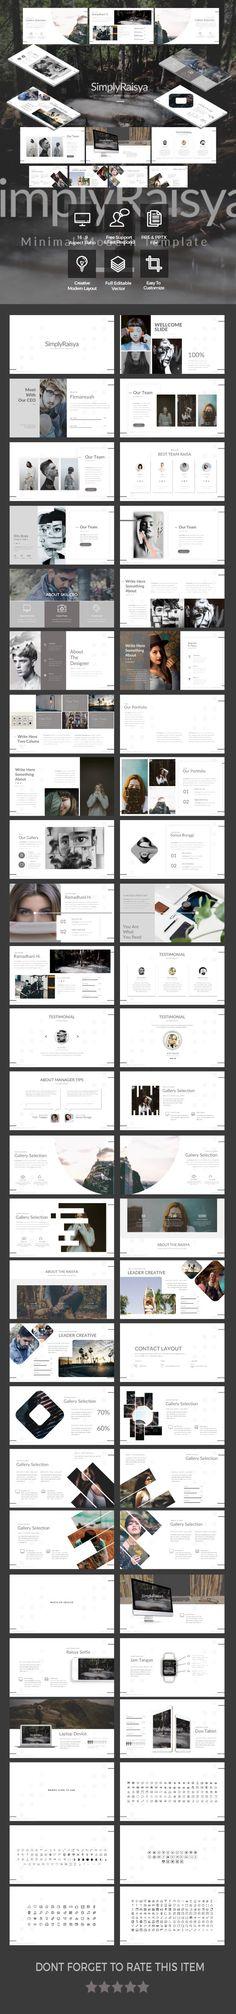 SimplyRaisya - Simple Google Slide Template - Google Slides Presentation Templates